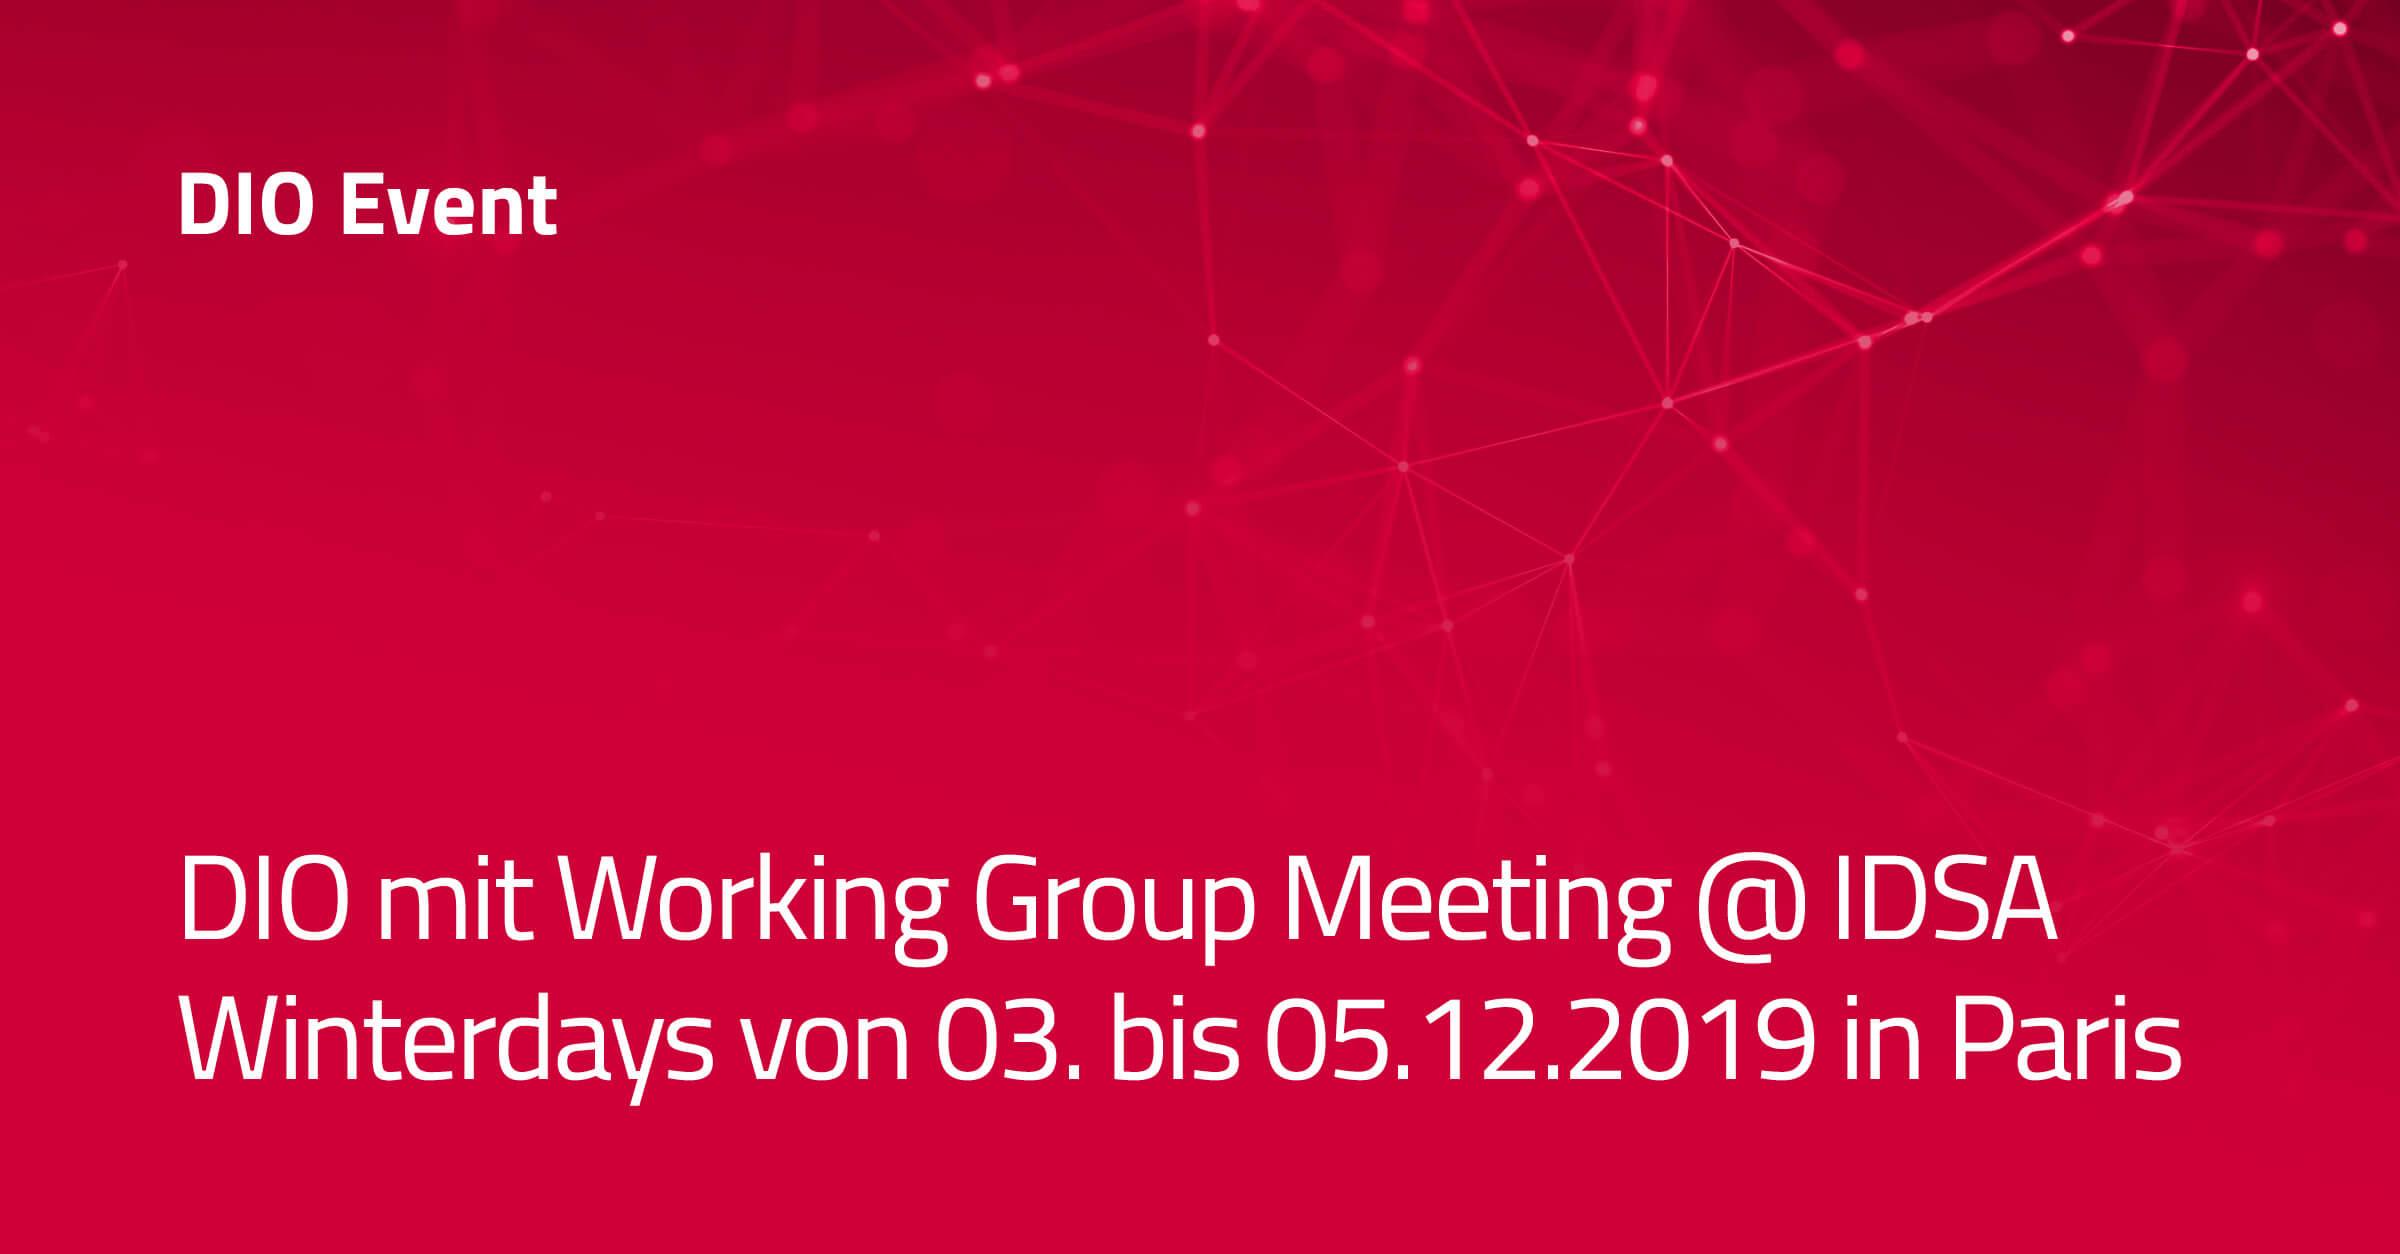 DIO_Event_WorkingGroupMeeting